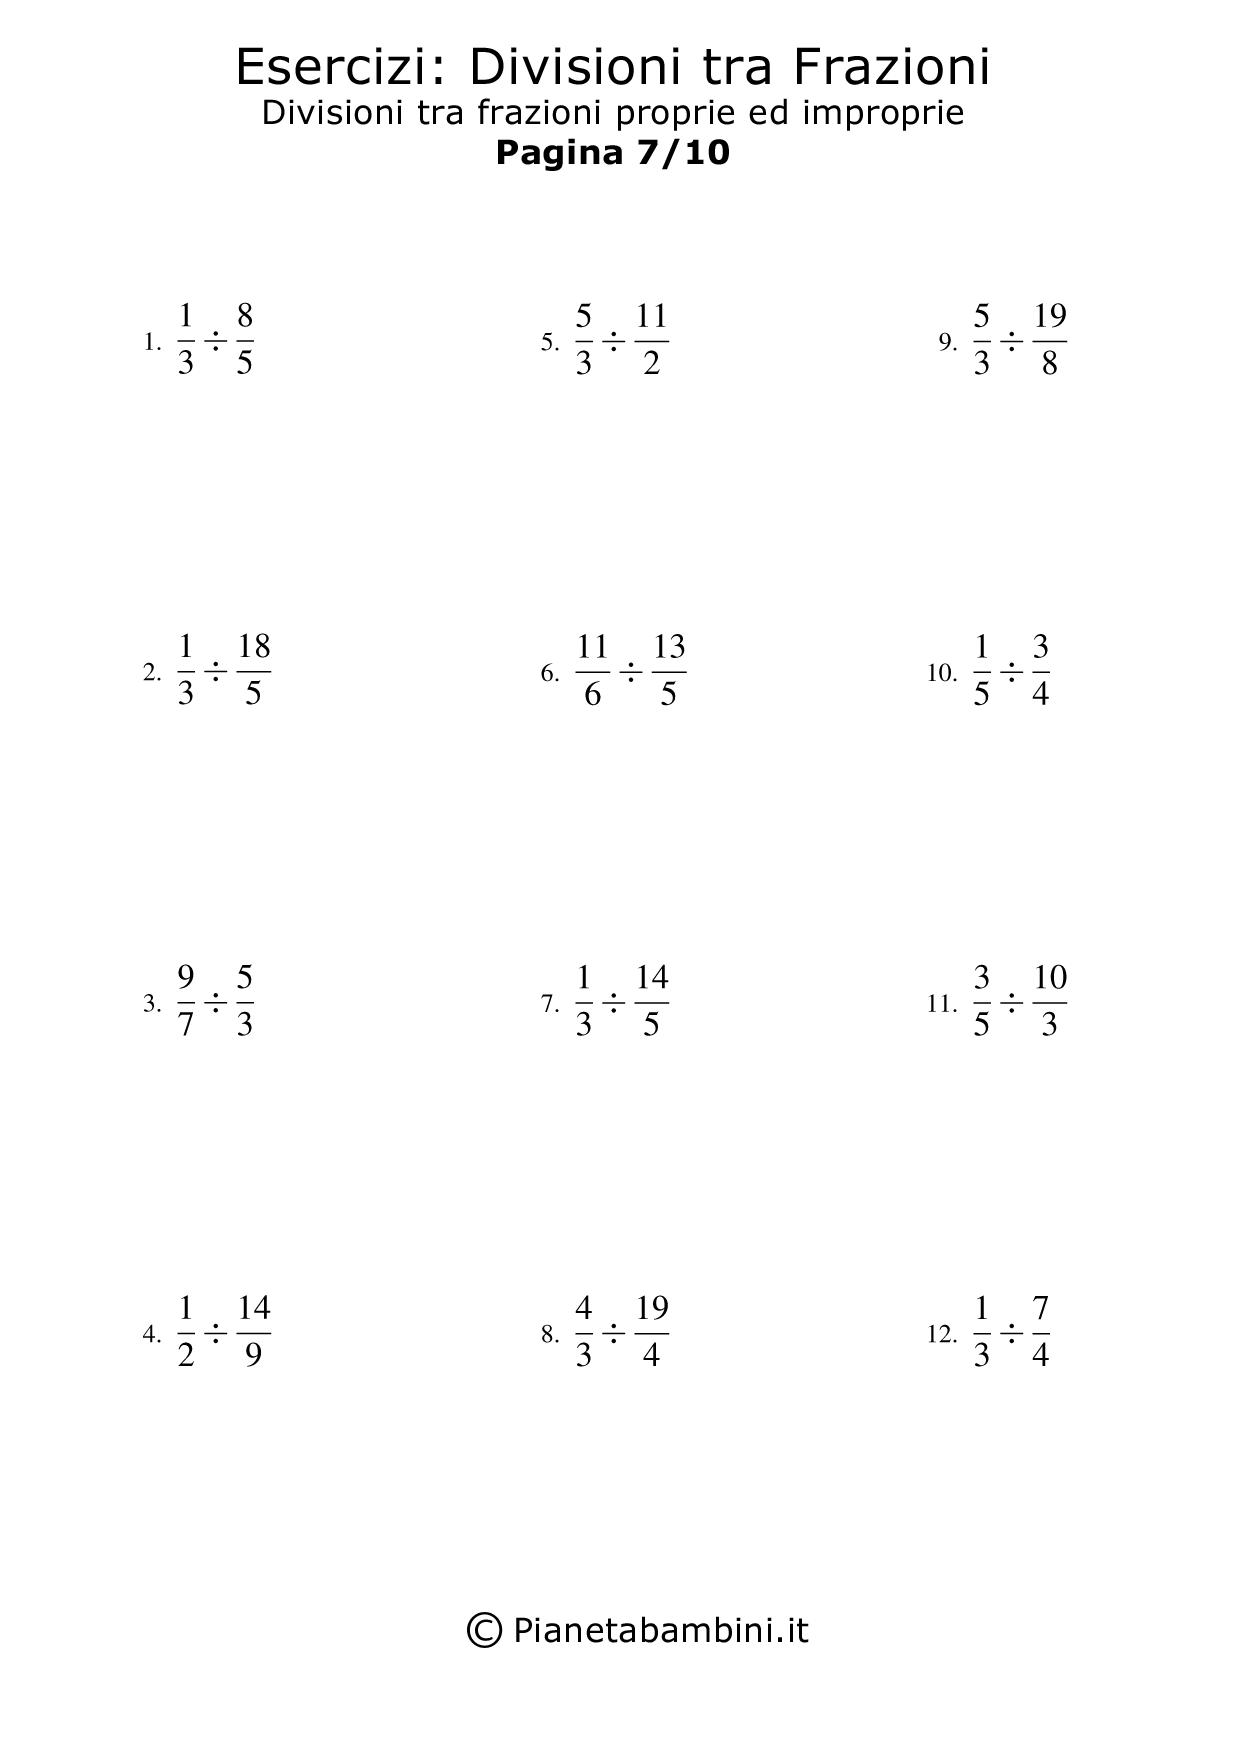 Esercizi-Divisioni-Frazioni-Proprie-Improprie_07